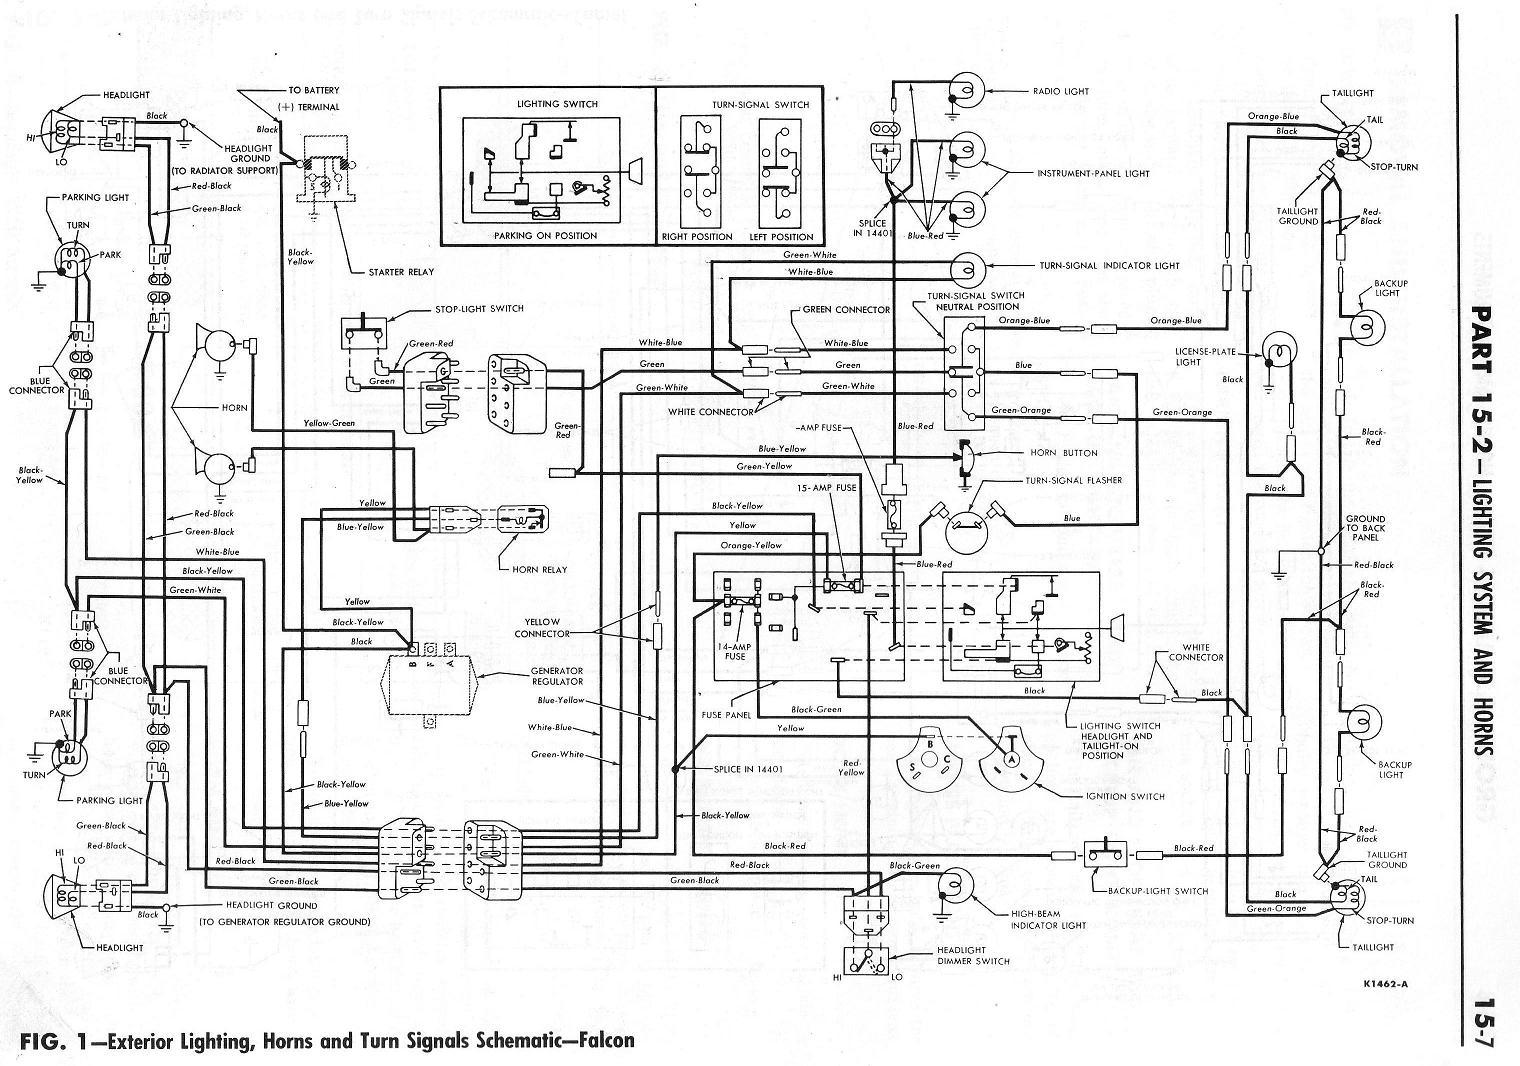 Stupendous 1964 Falcon Wiring Diagram Wiring Diagram Database Wiring Cloud Ostrrenstrafr09Org